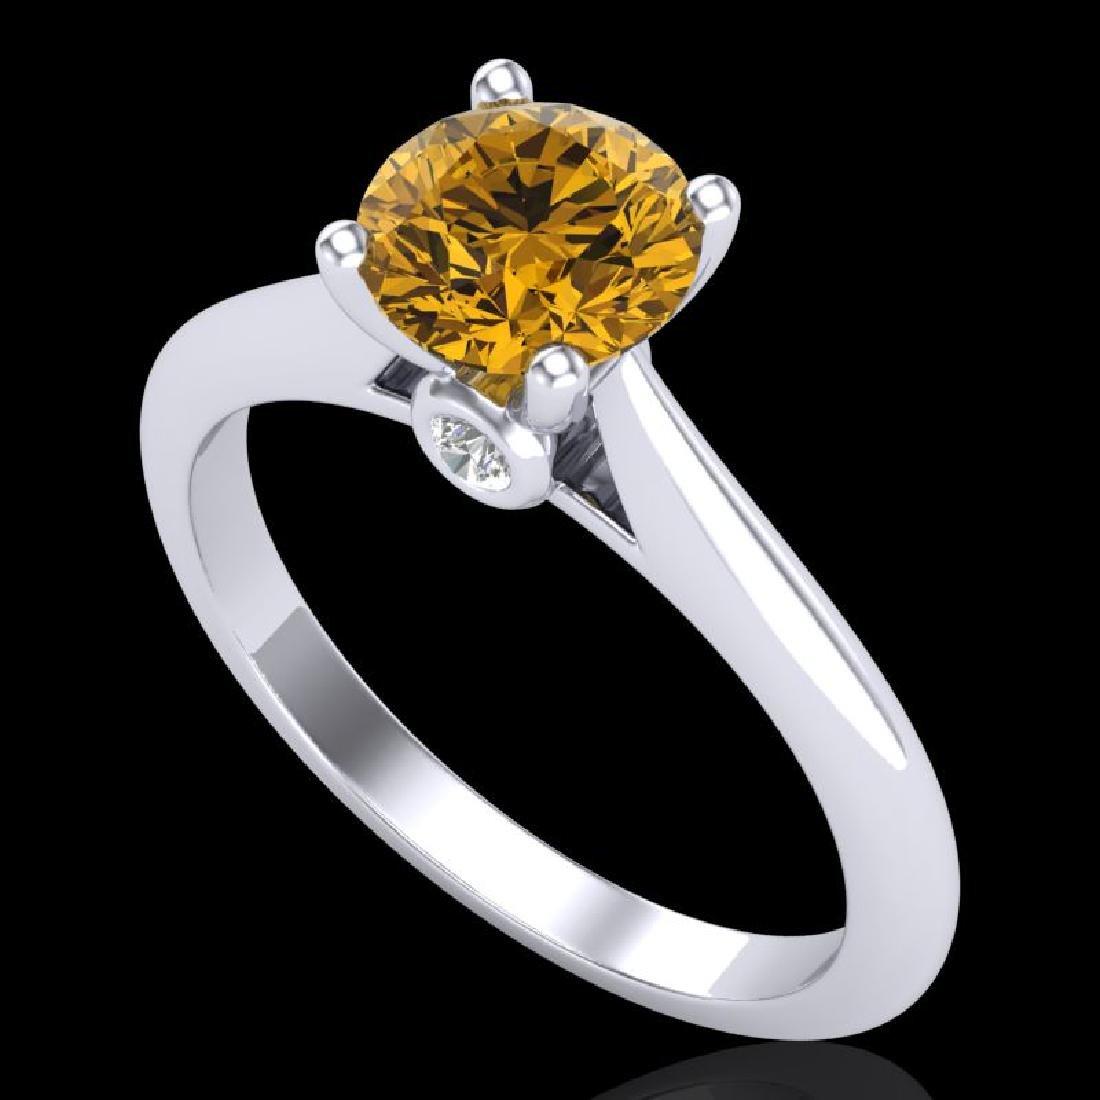 1.08 CTW Intense Fancy Yellow Diamond Engagement Art